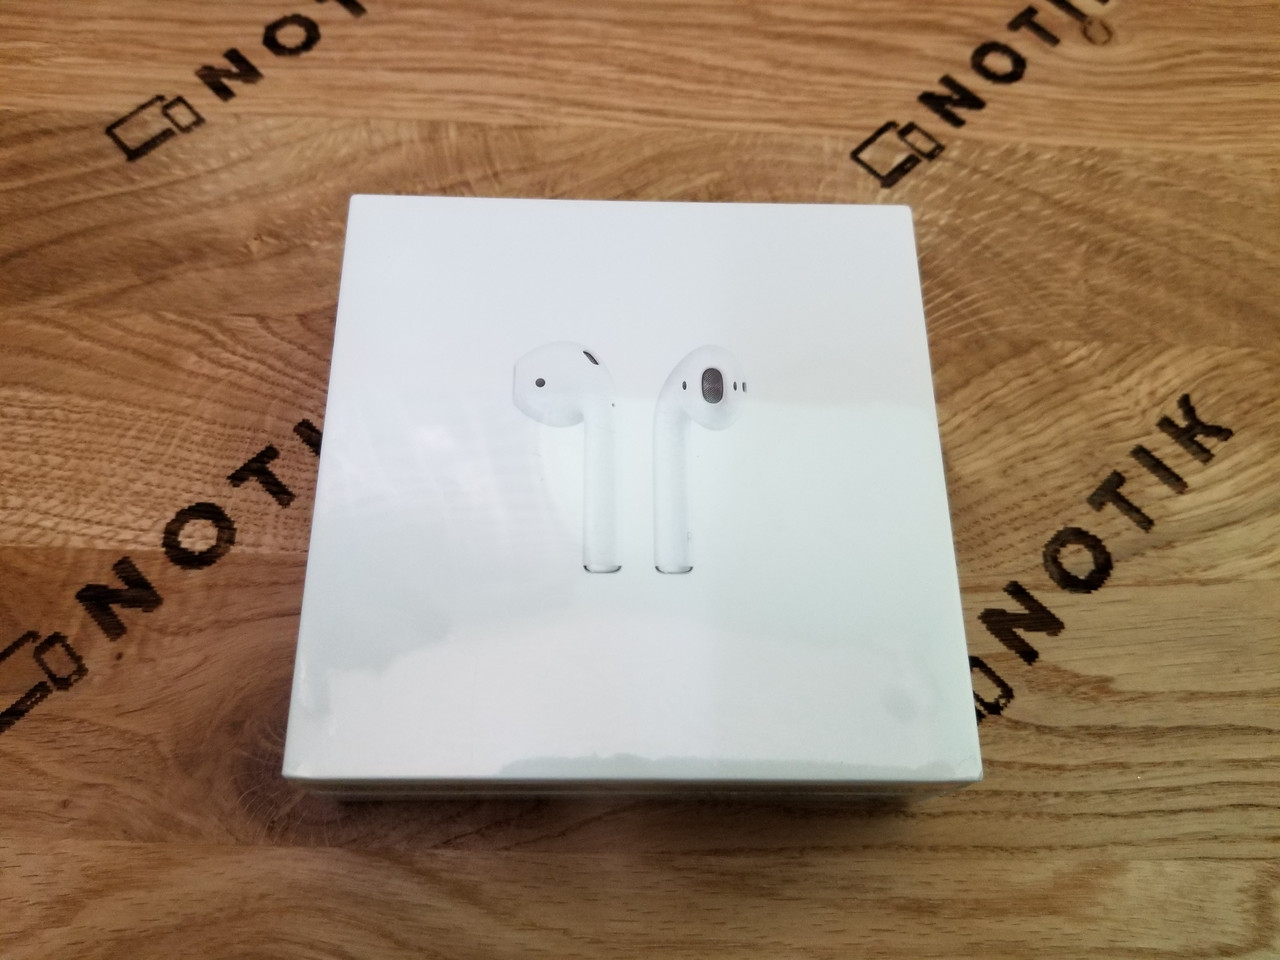 AirPods 2Gn Charging Case Оригінальні навушники